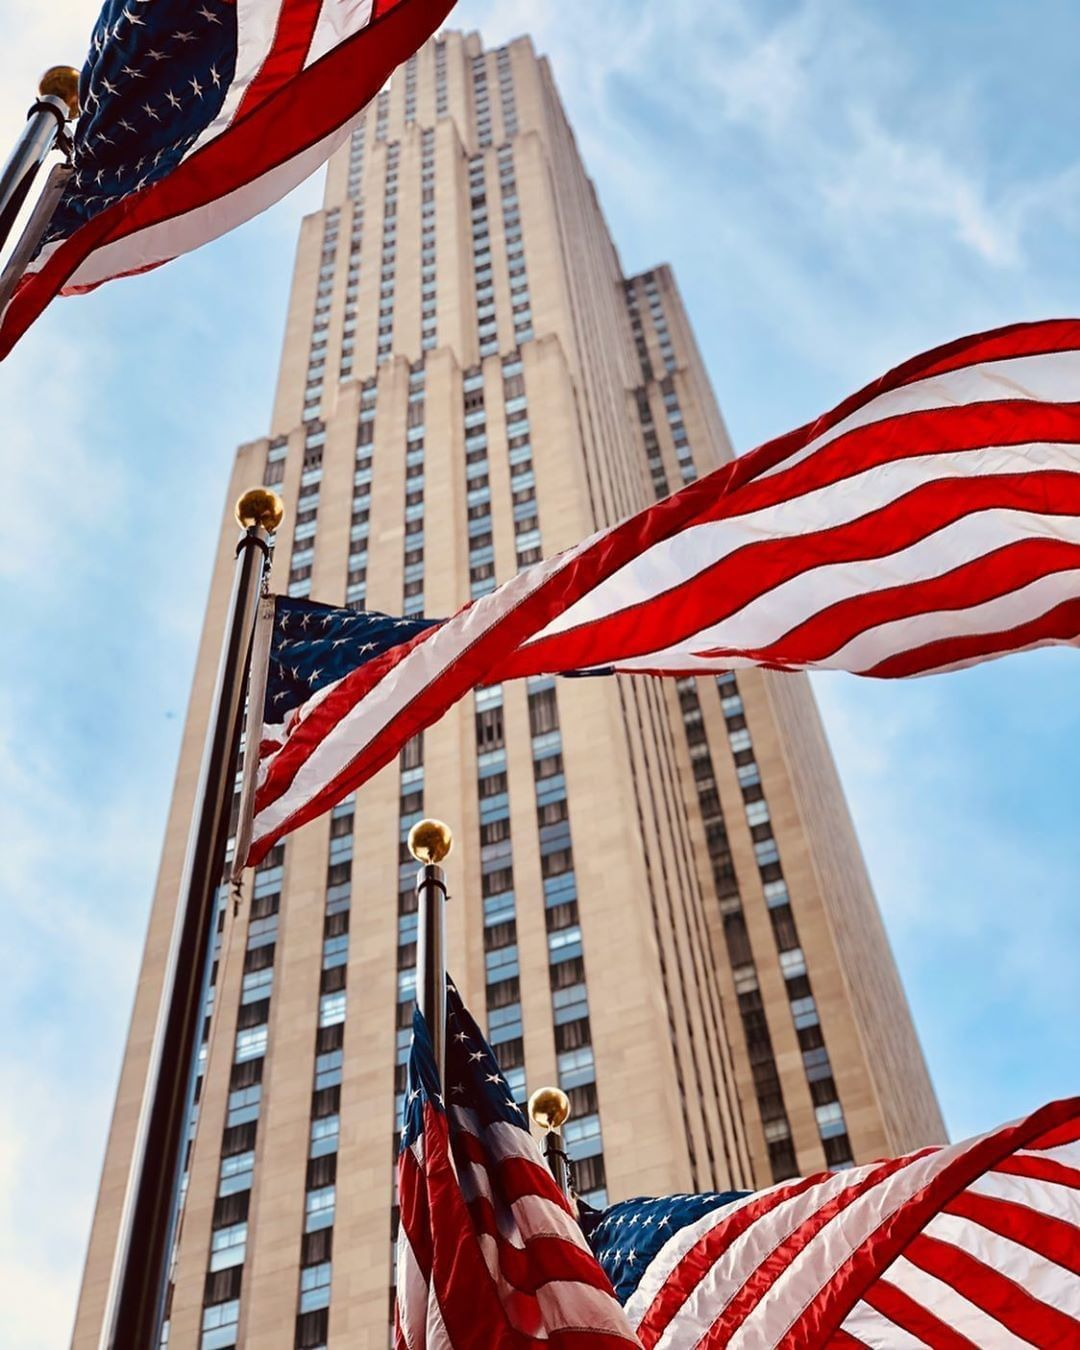 3,934 Me gusta, 24 comentarios - Rockefeller Center (@rockefellercenter) en Instagram: